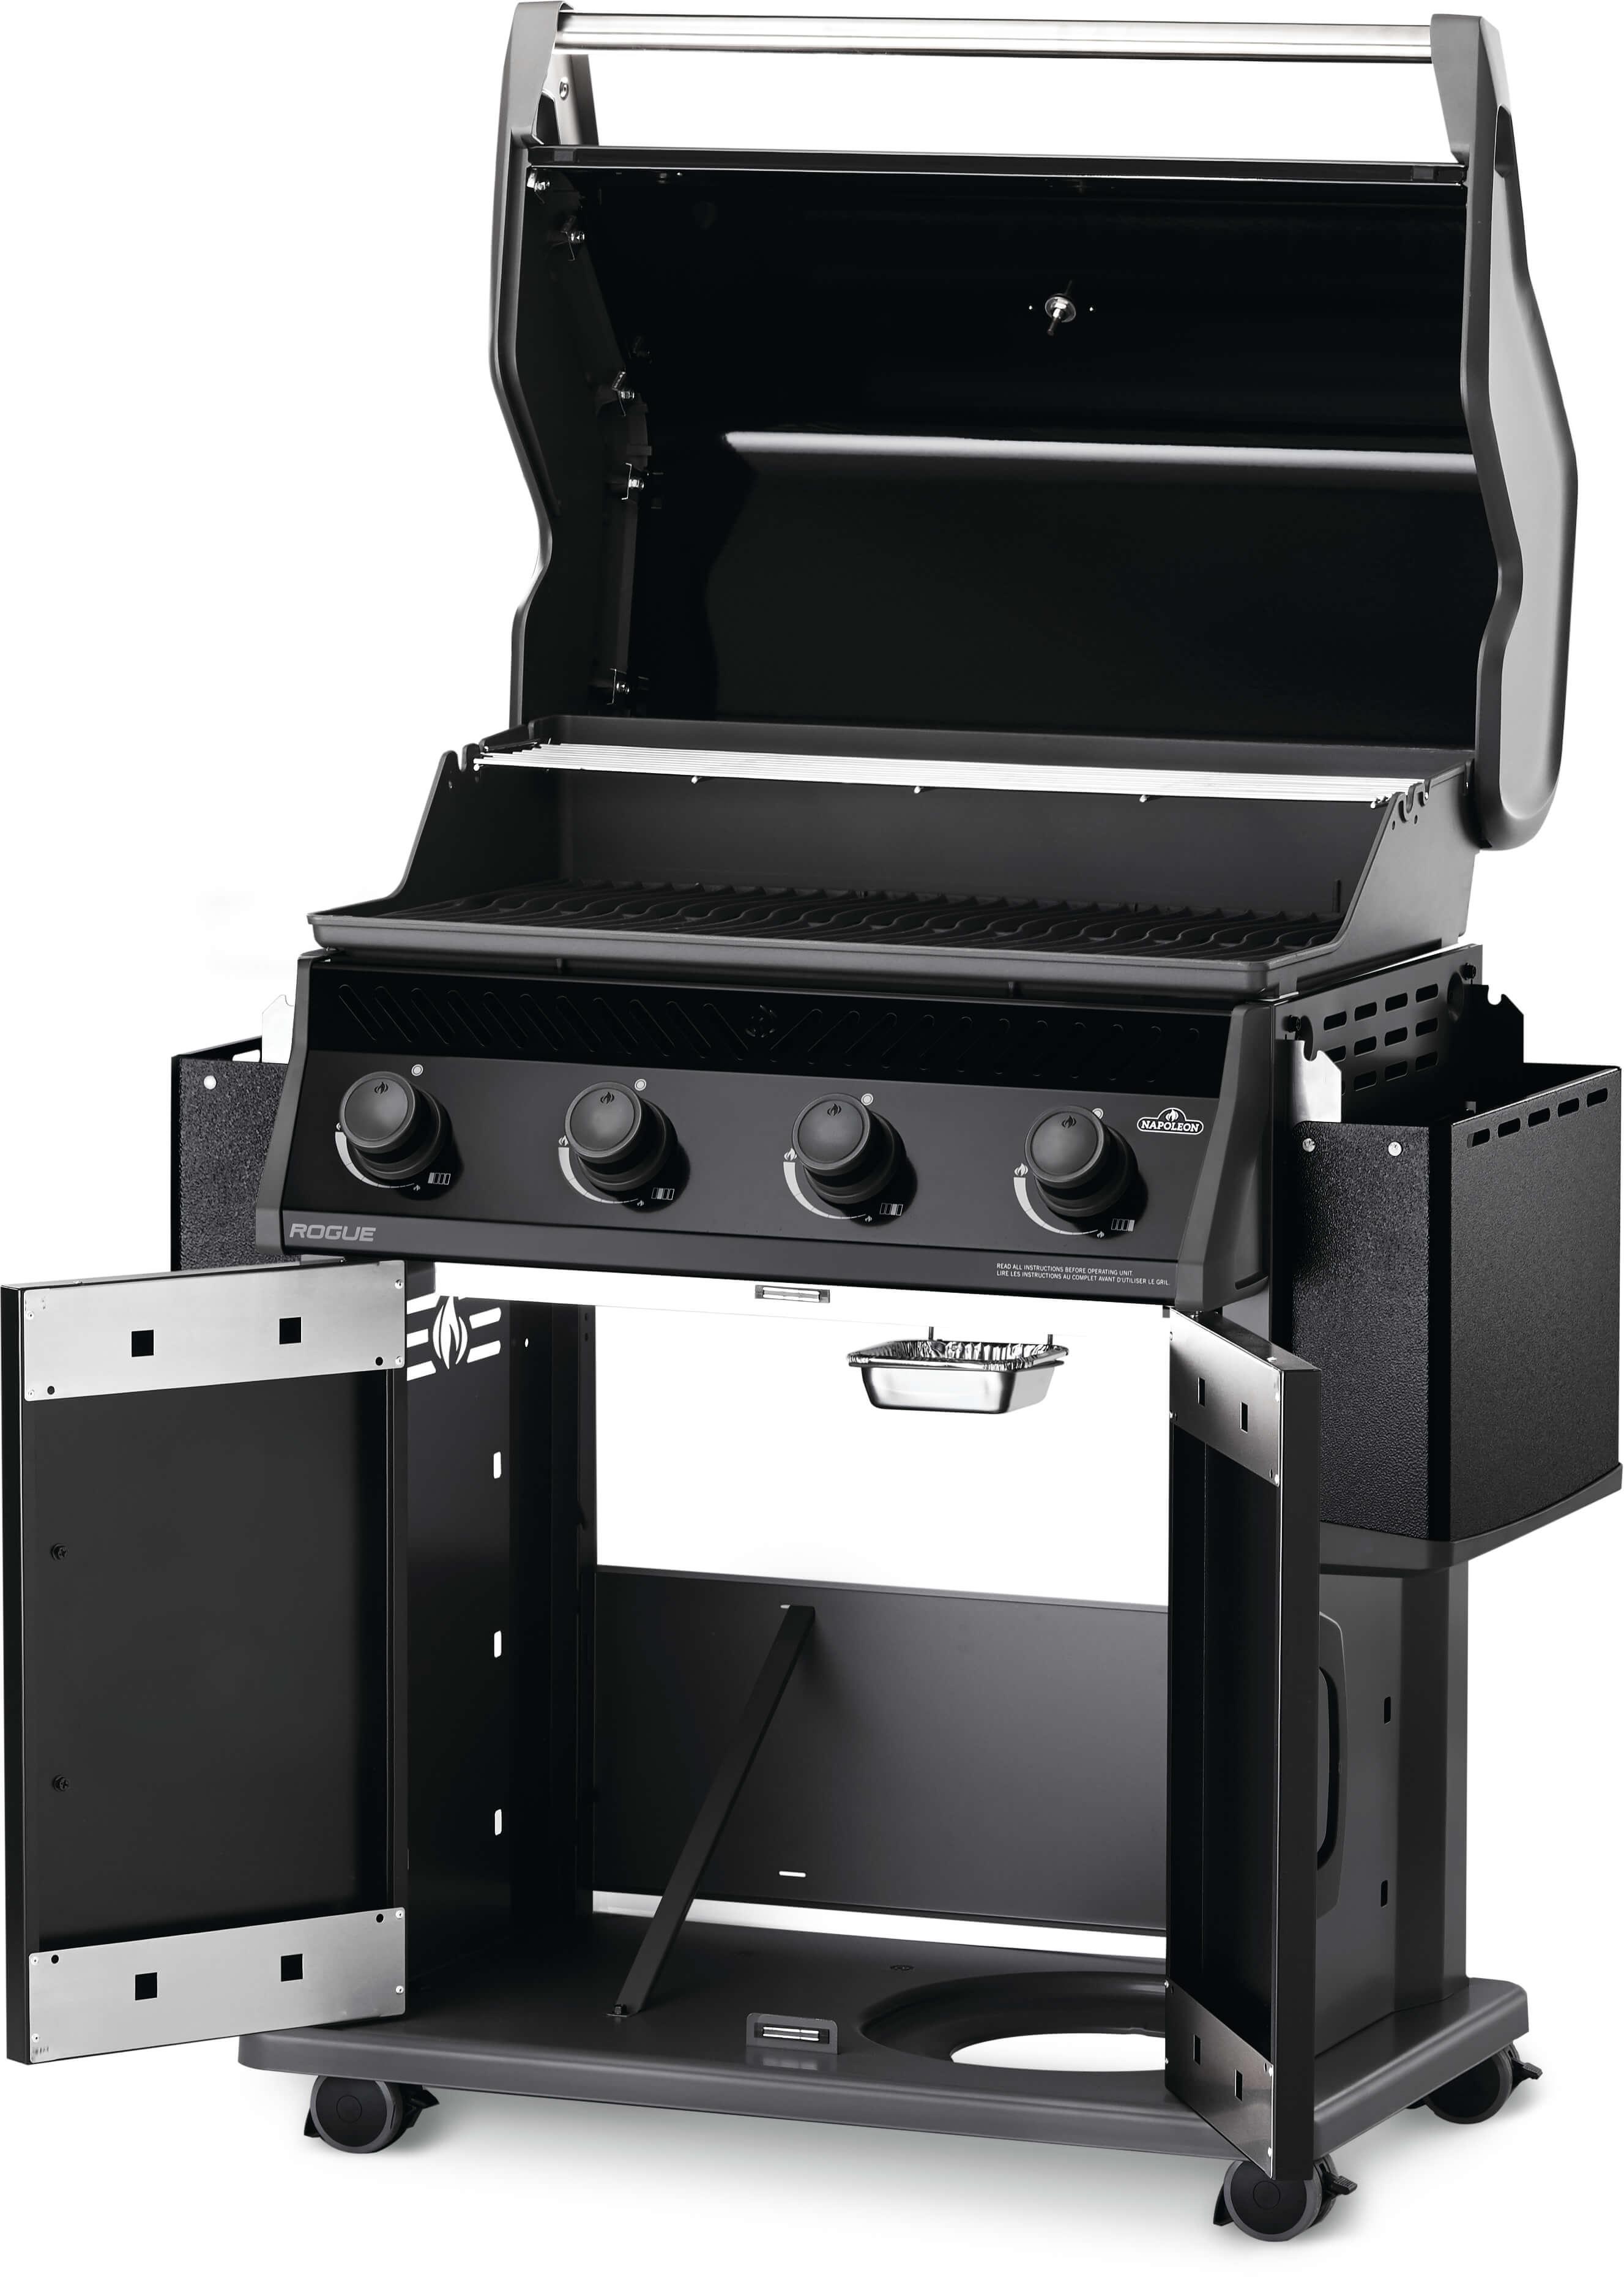 Rogue® 525 Propane Gas Grill, Black